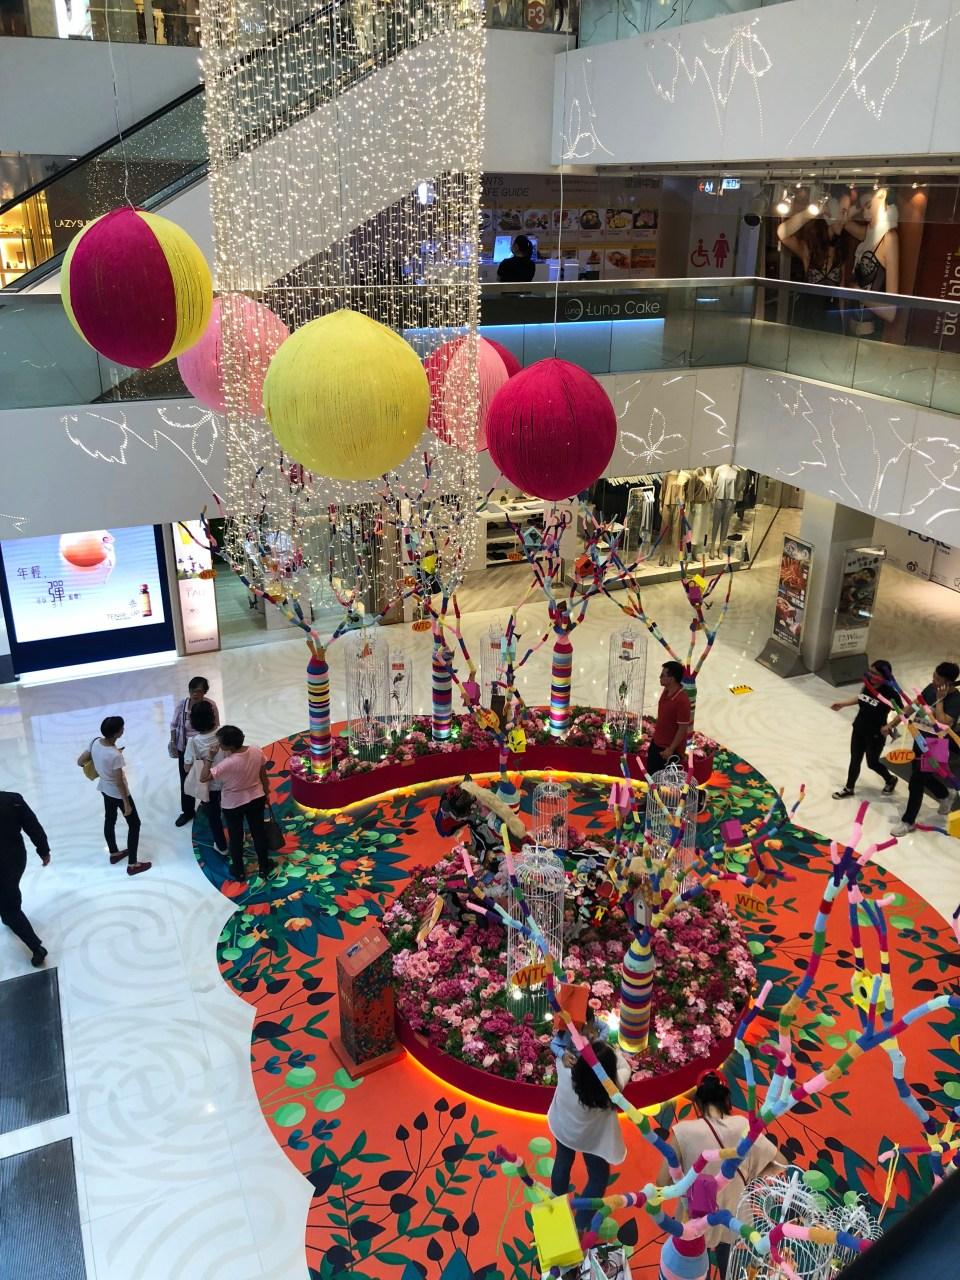 Hong Kong mall - stuffed animal horse display 1